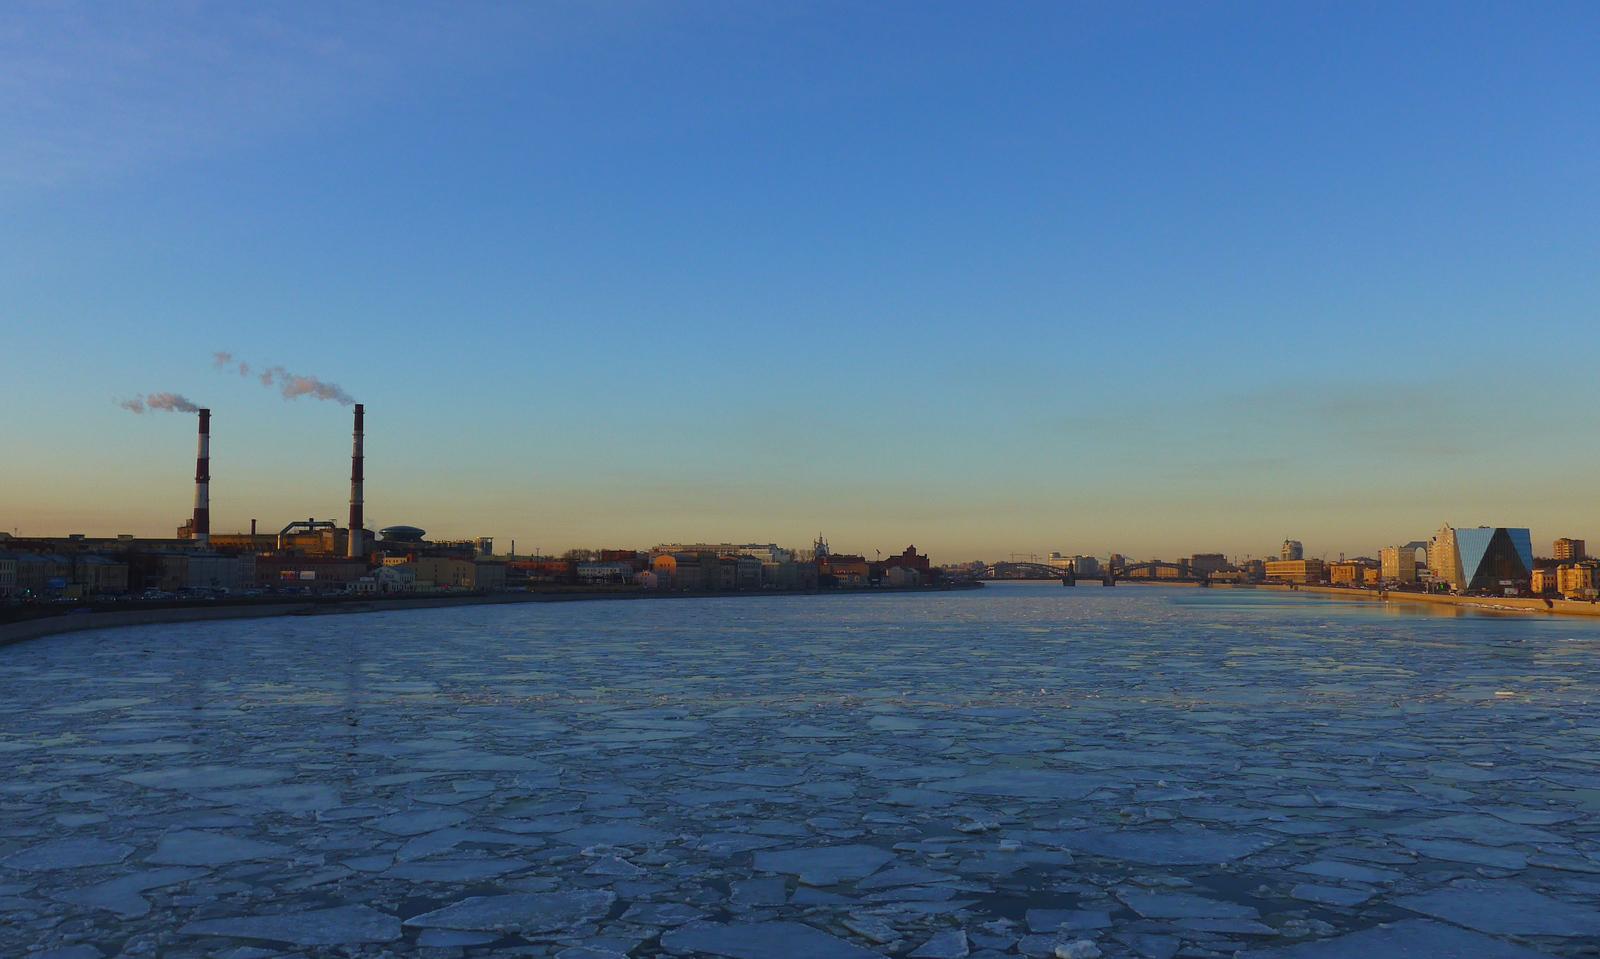 Ice Drift, St Petersburg, Russia, 2015.03.26 | Санкт-Петербург, Россия, мост А.Невского